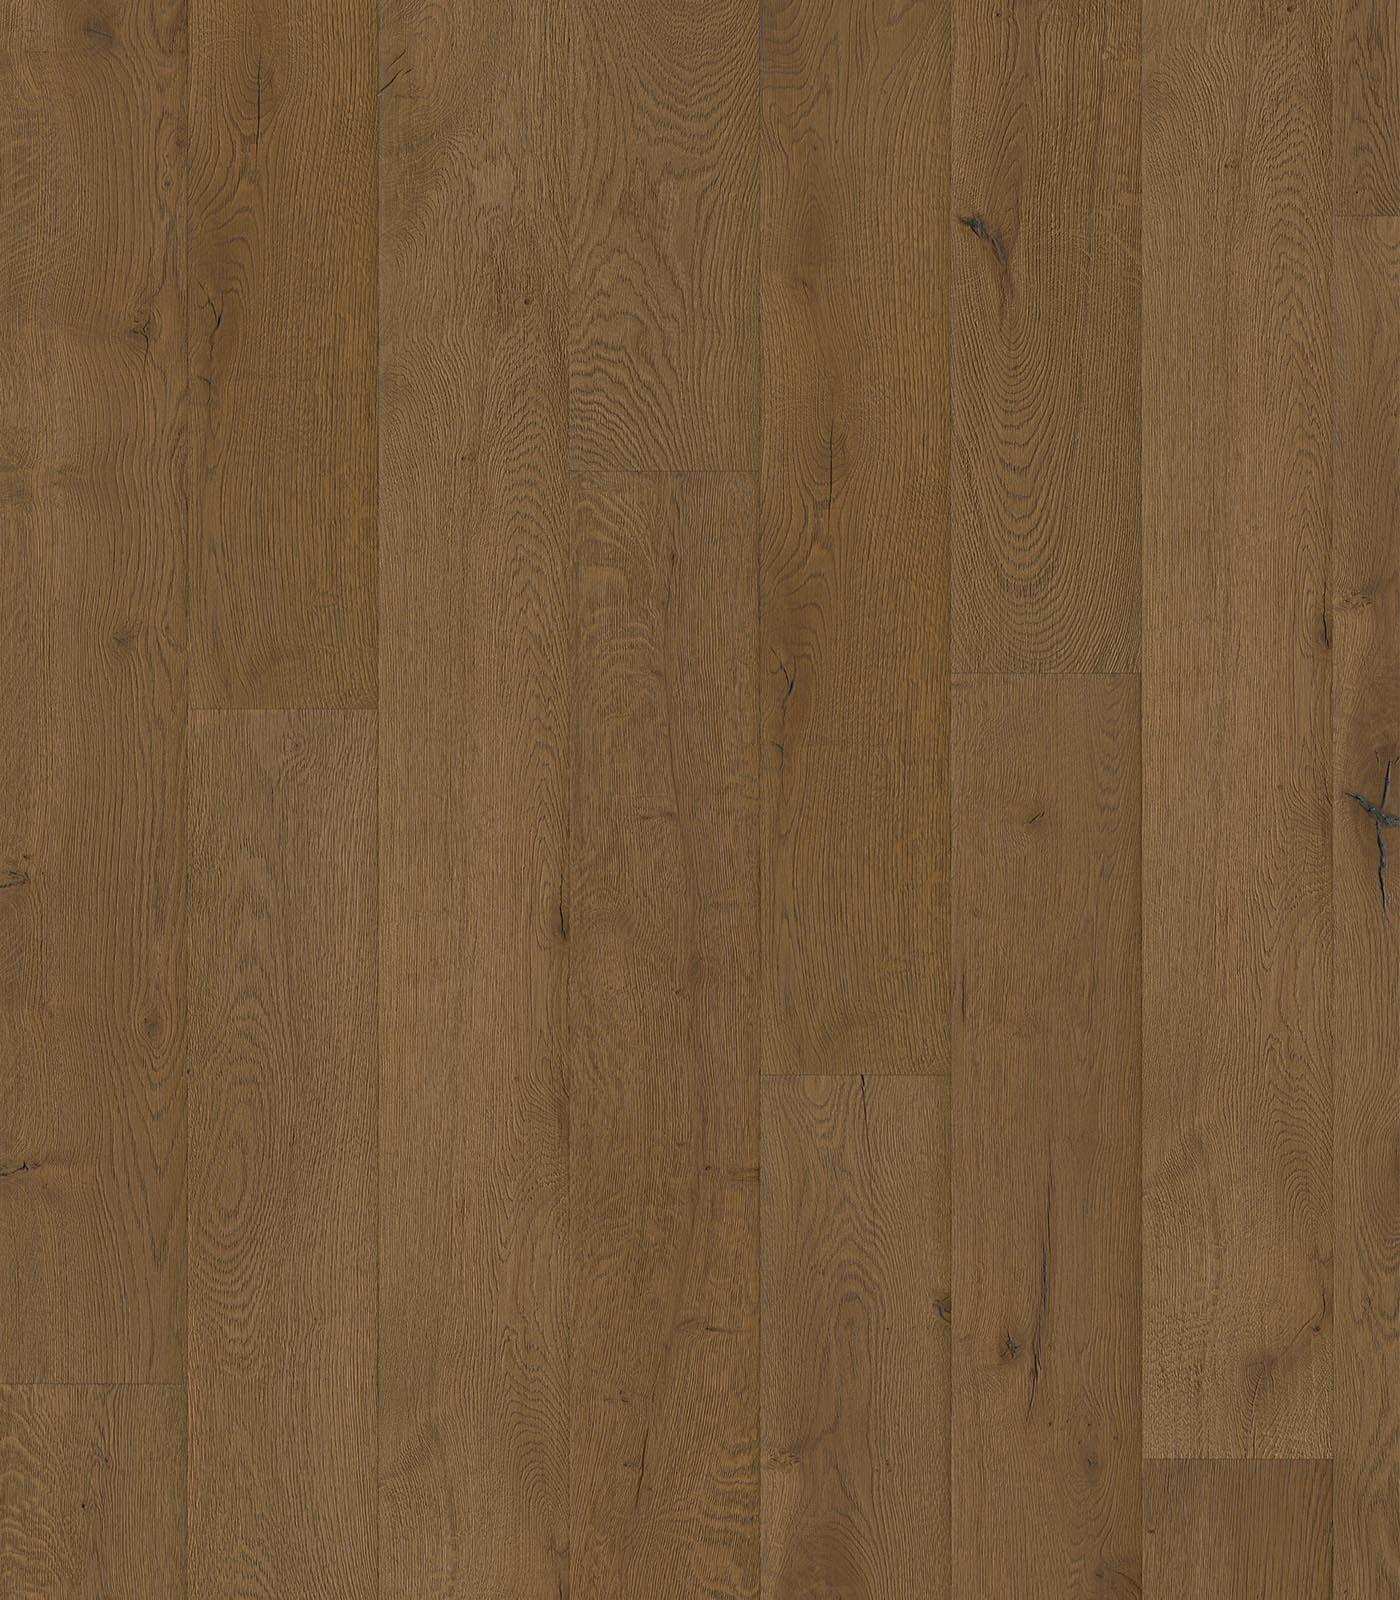 Salamanca-European Oak floors-Heritage collection-flat